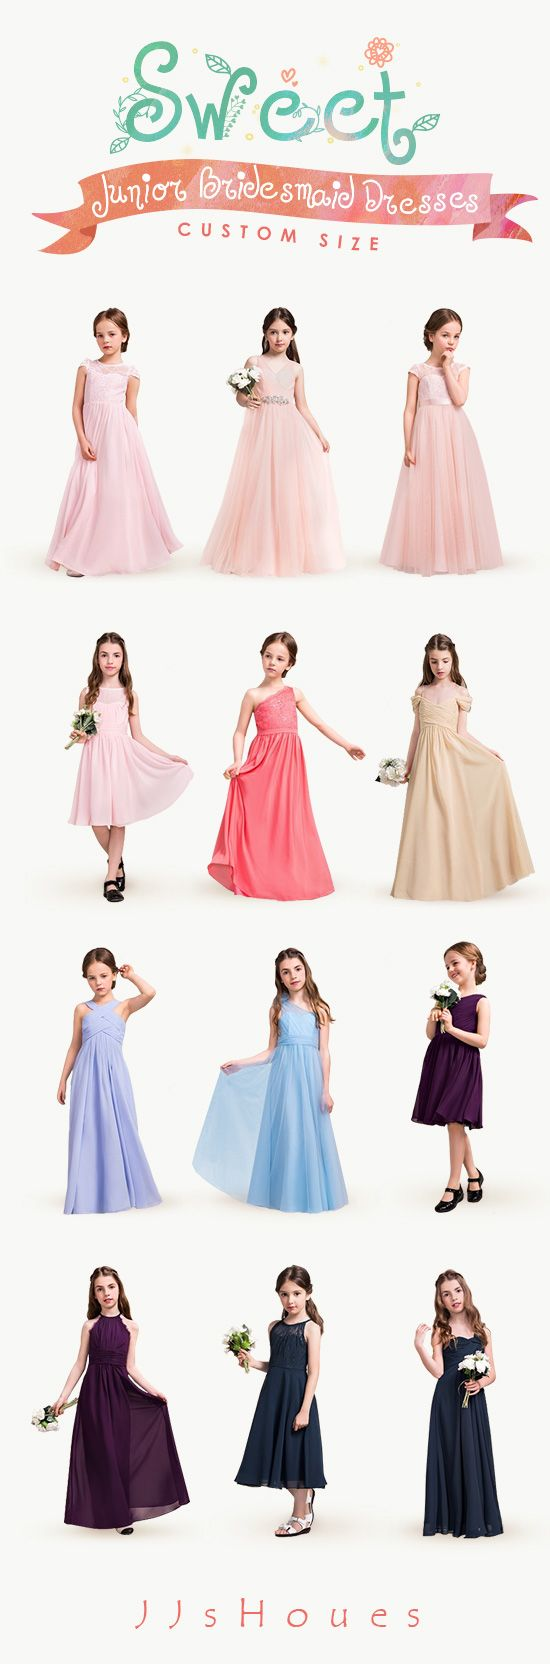 Best 25 junior bridesmaid dresses ideas on pinterest styles of sweet junior bridesmaid dresses custom size bridesmaiddresses ombrellifo Choice Image